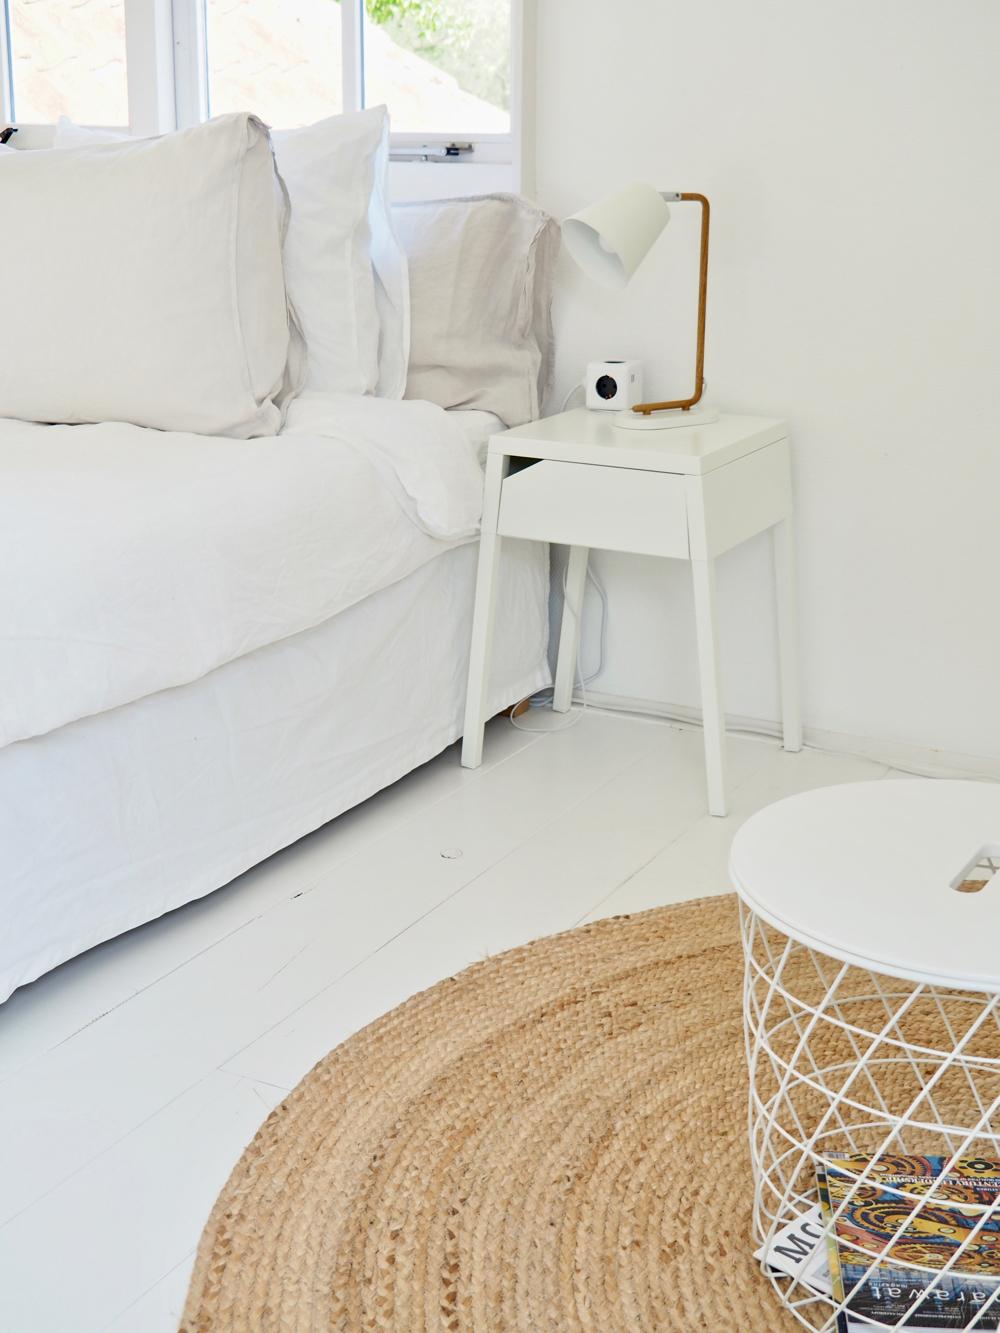 Slaapkamer in alle tinten wit. Wit bed met wit nachtkastje en wit tafeltje.